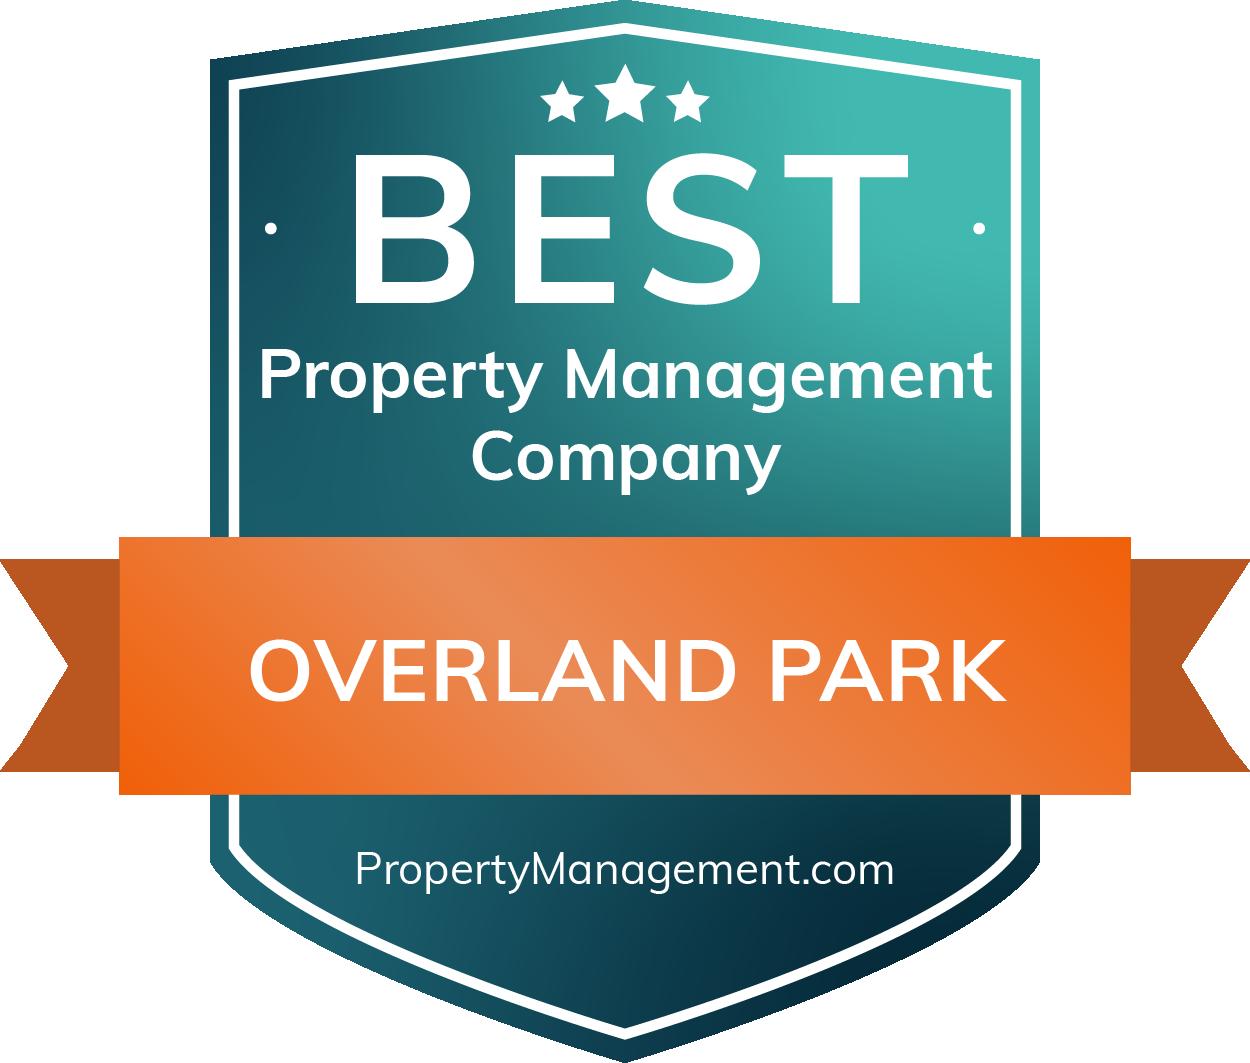 The Best Property Management in Overland Park, KS